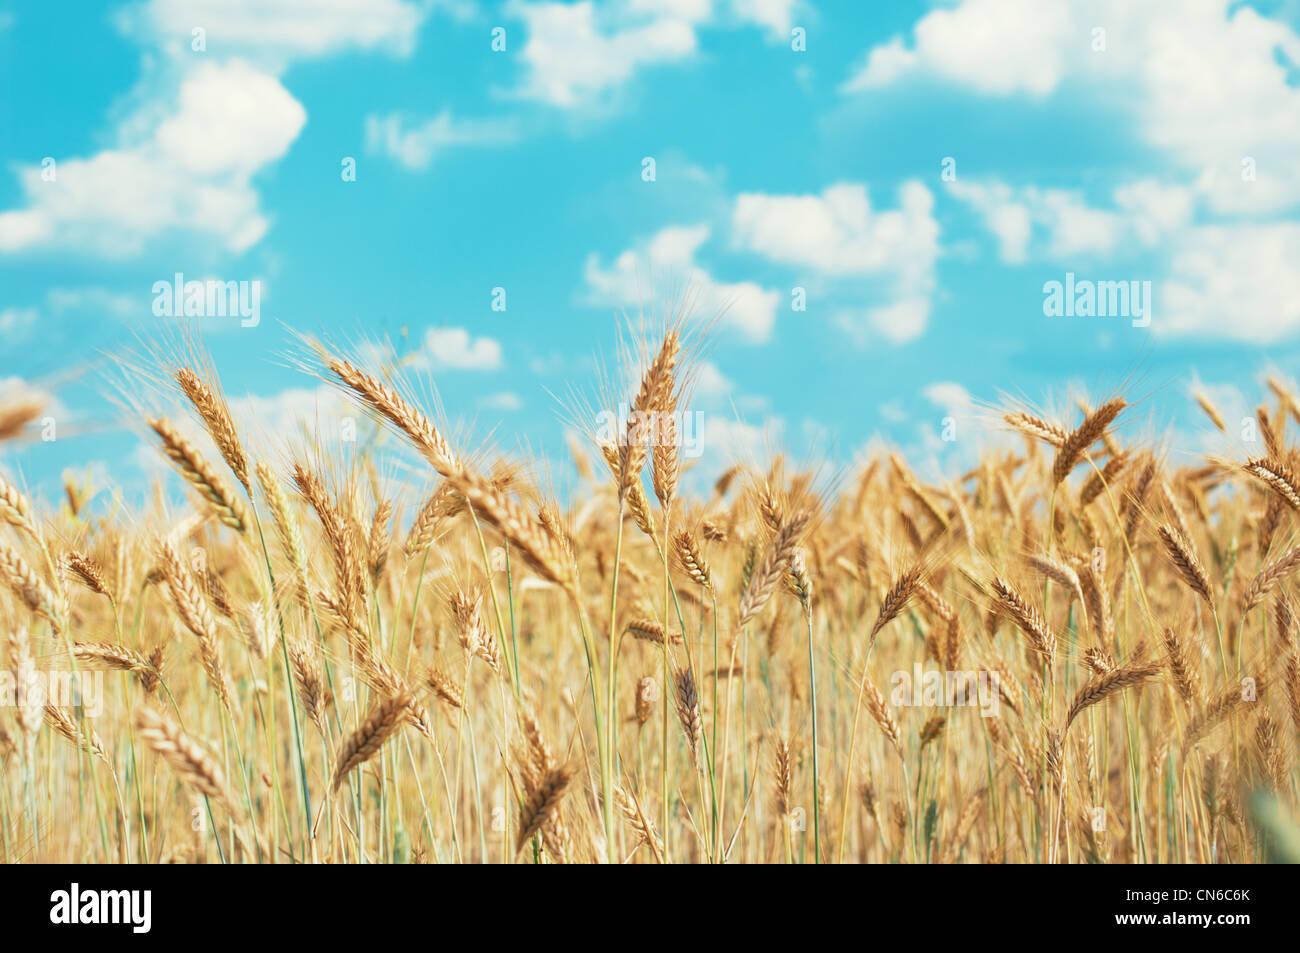 Maisfeld und blauer Himmel im Sommer Stockbild